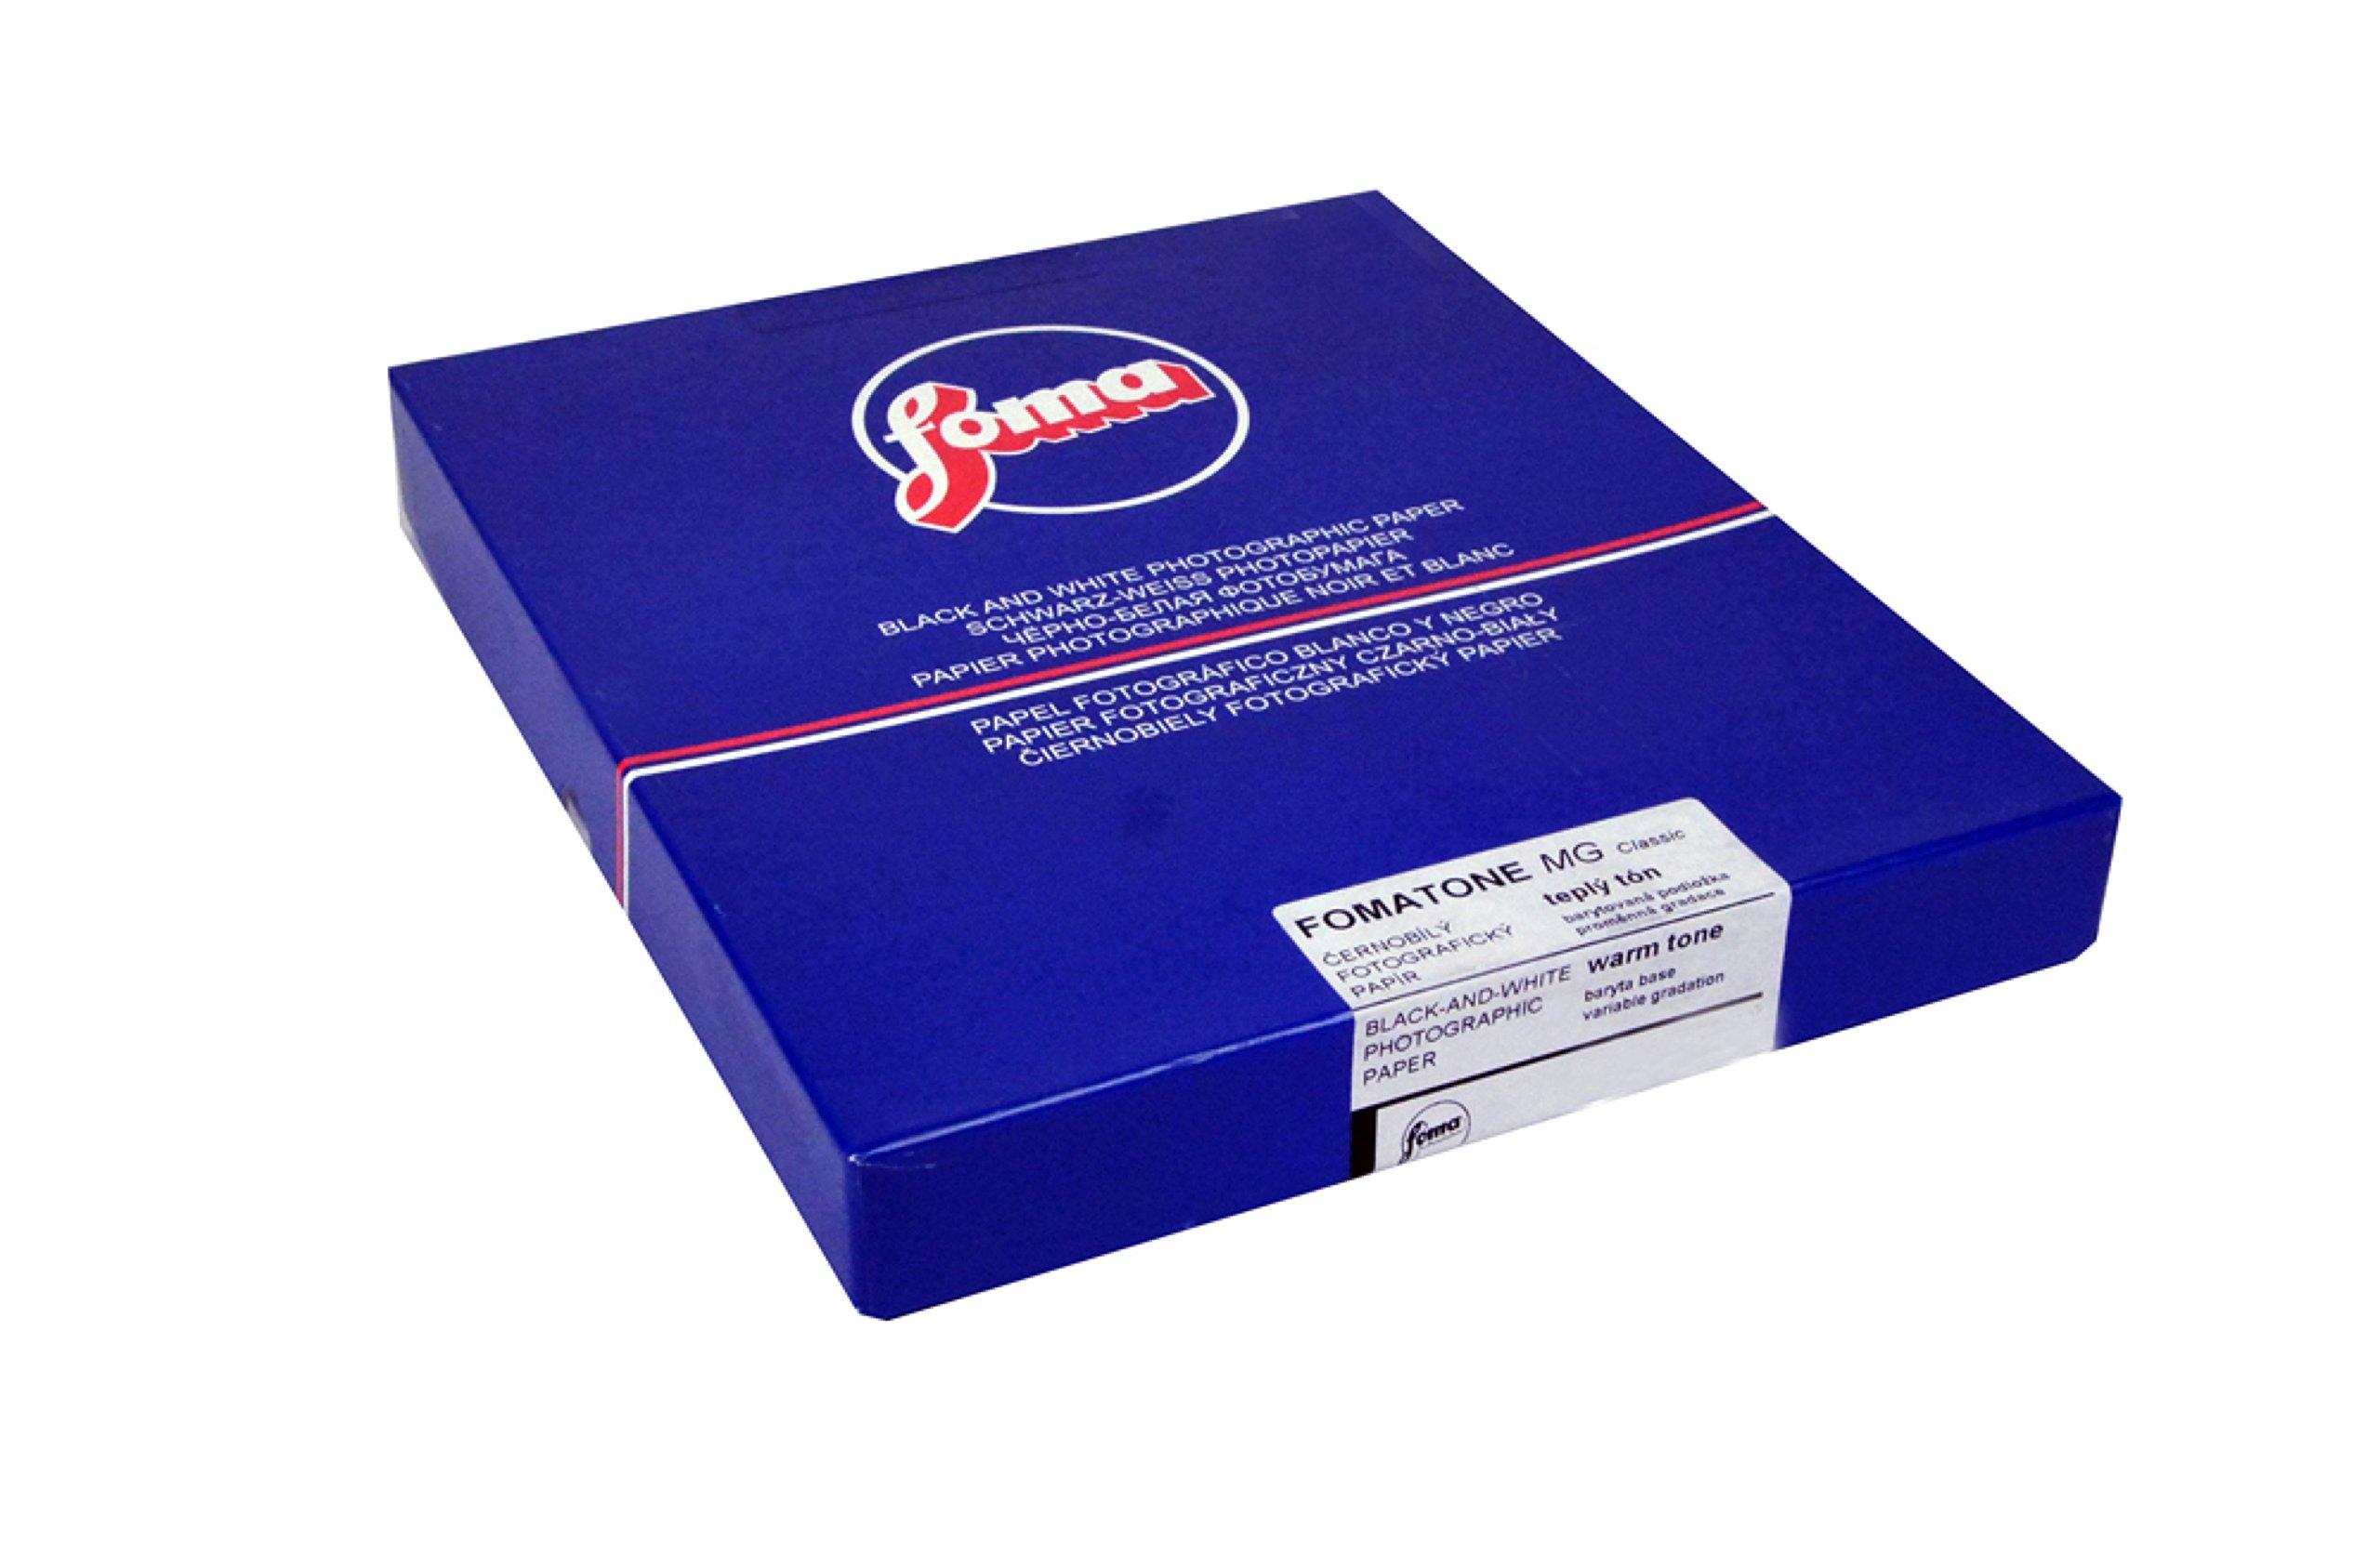 Foma Fomatone 131 VC FB Warmtone Glossy Black & White Photographic Paper, 8x10, 100 Sheets